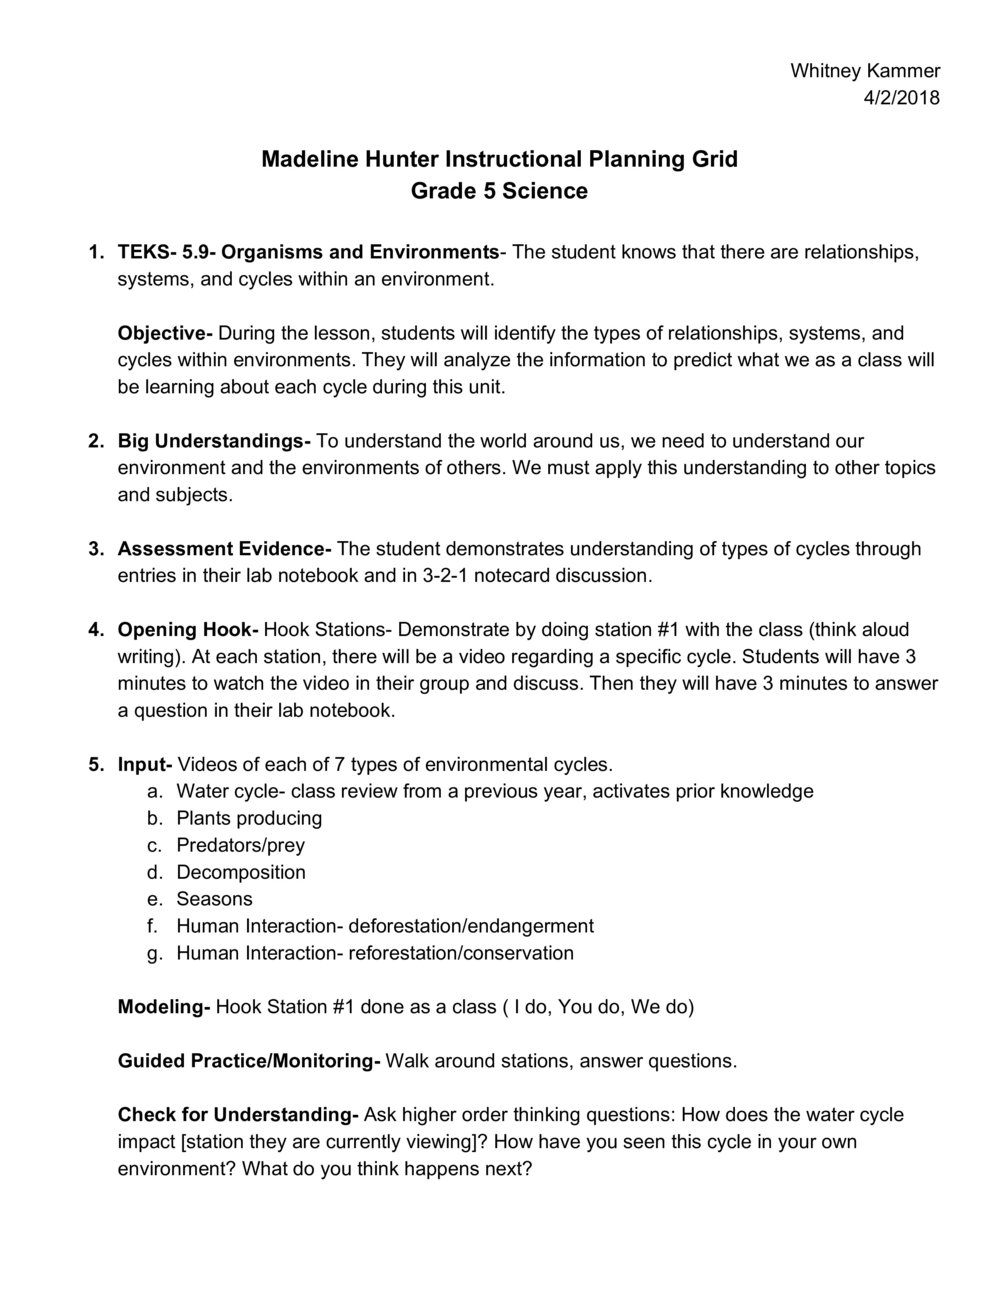 Ipg Lesson Plan 1 Jpg